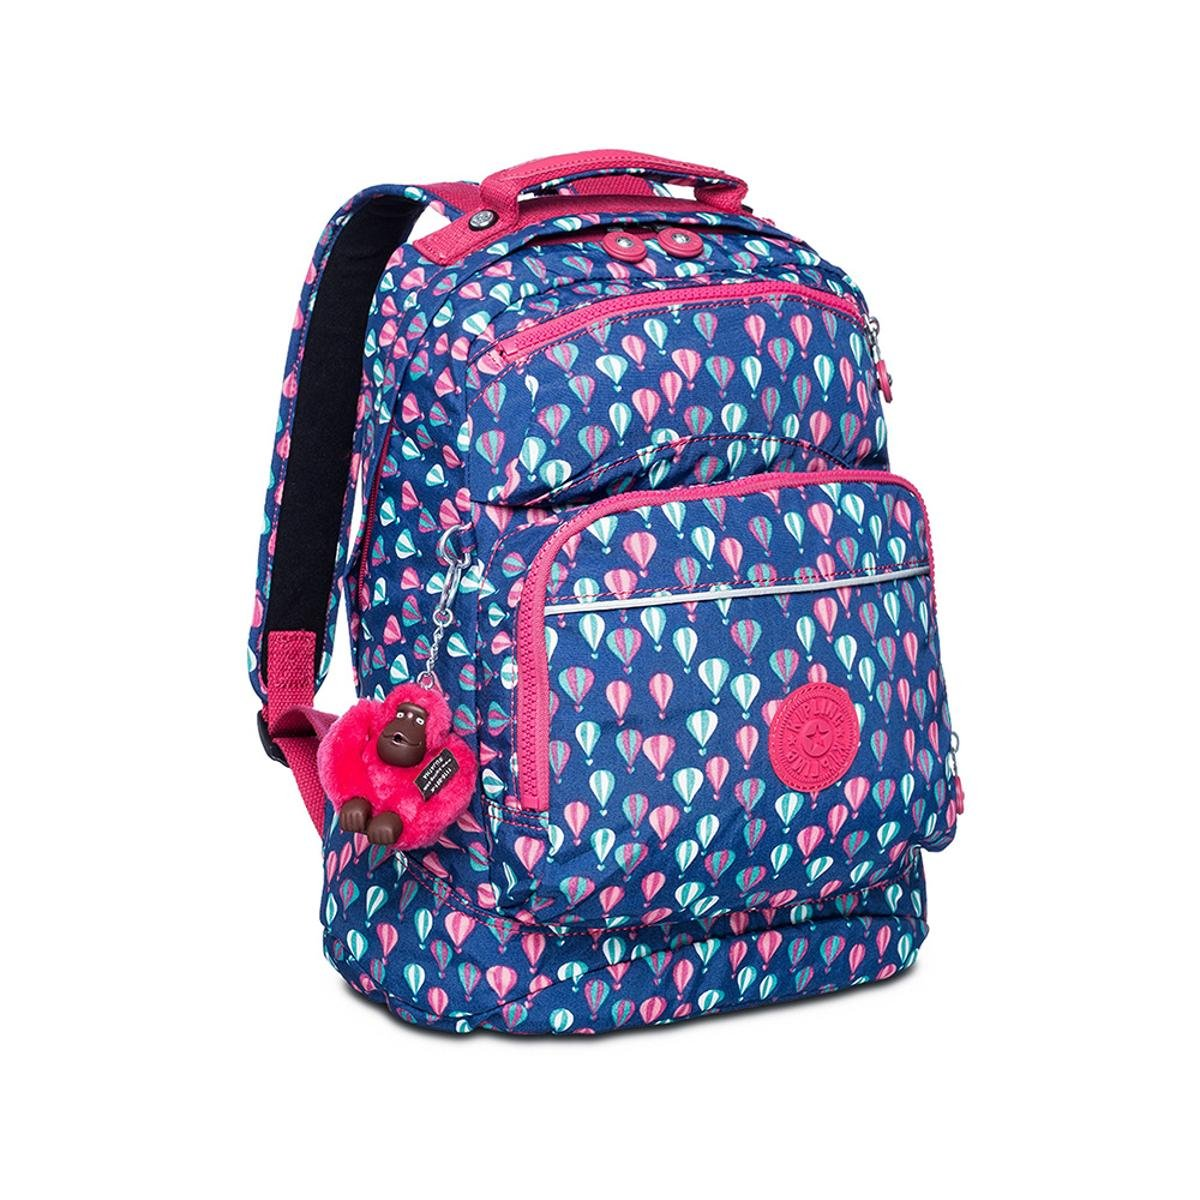 c65a75ea1 Mochila Kipling Ichiwa - Azul e Pink | Zattini